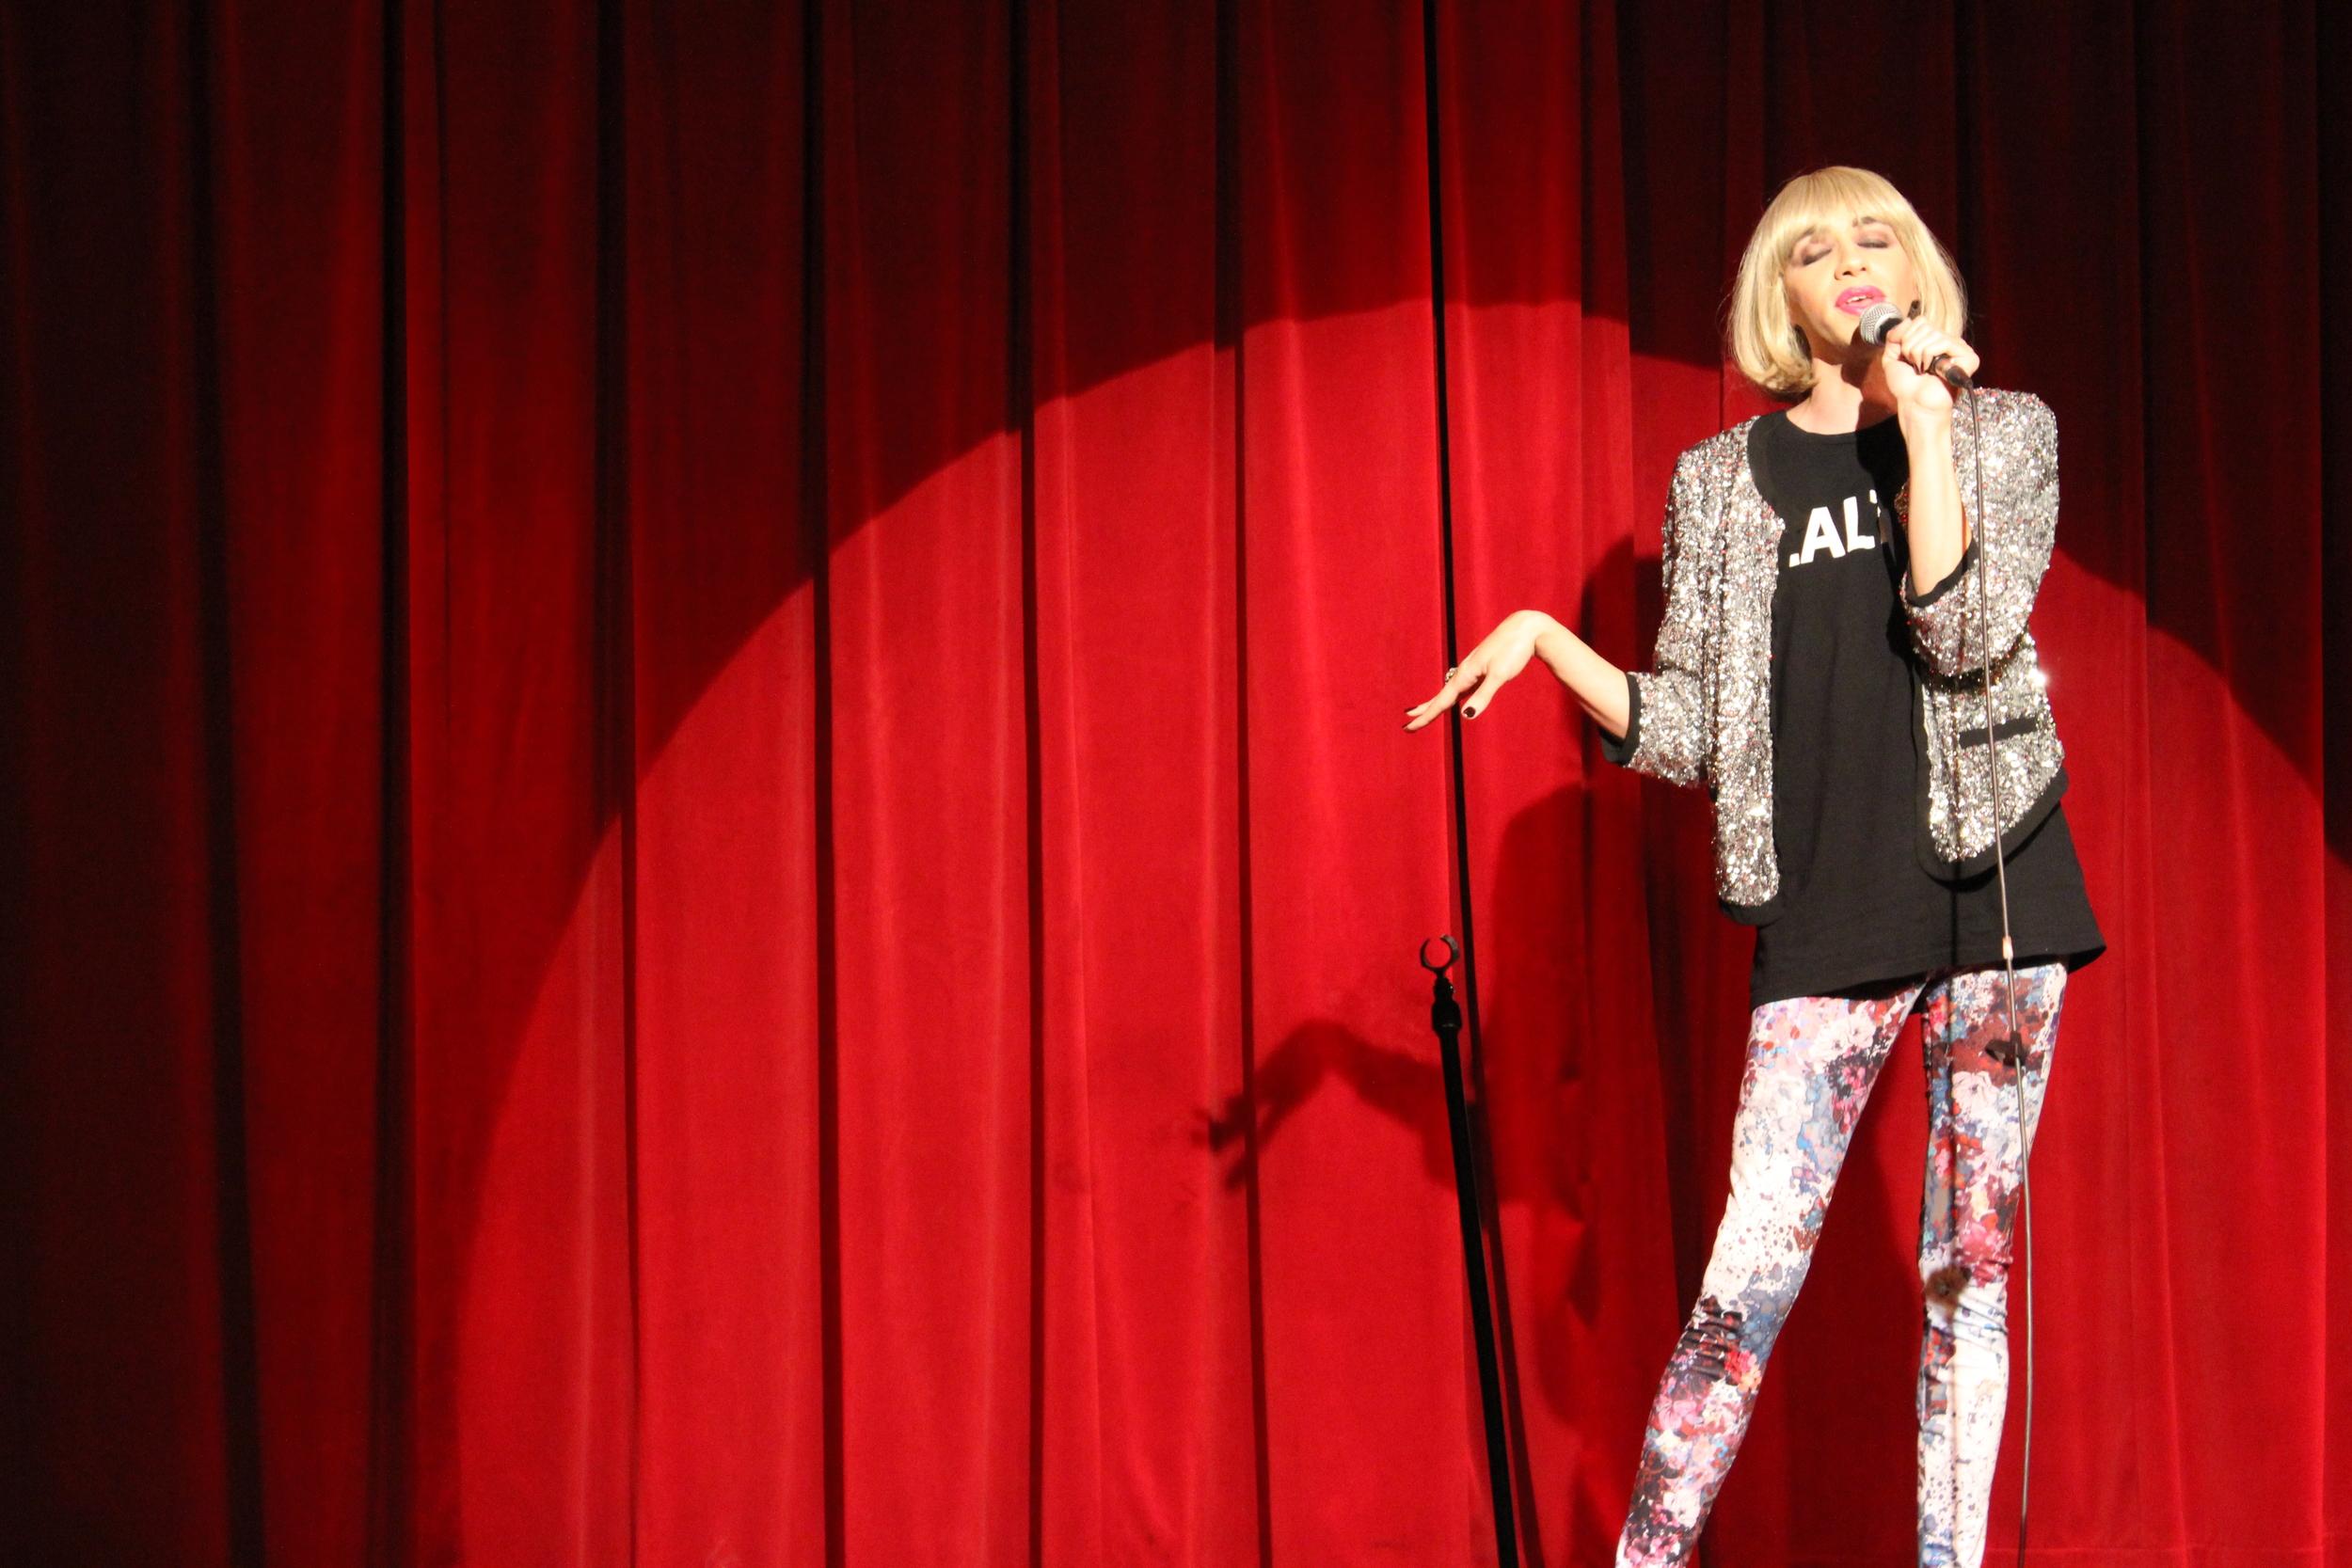 Tranna Wintour brings her comedy act to the Gender Blender stage.  September 20, Café L'Artère, Montréal